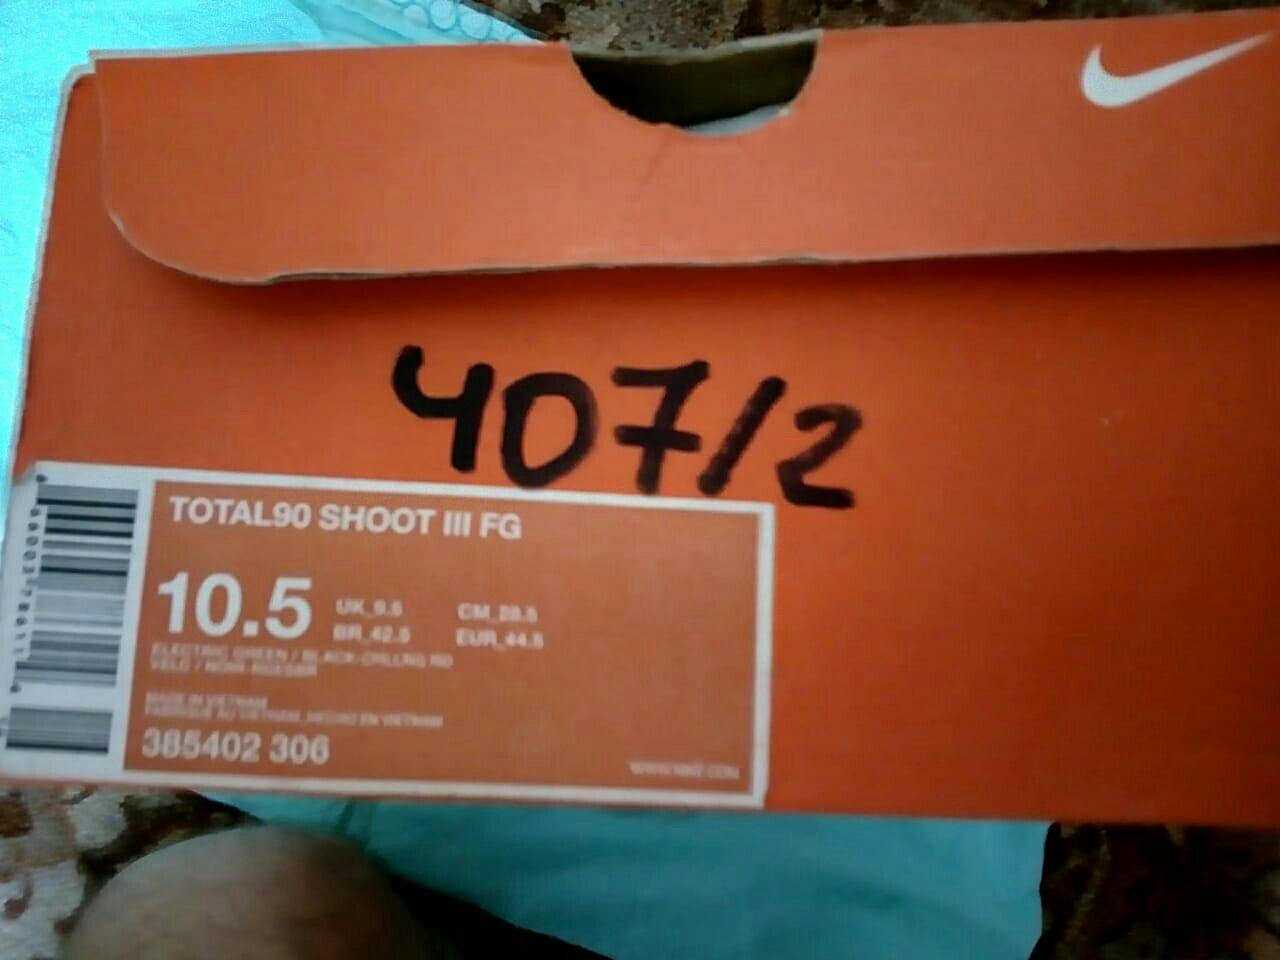 Nike / Бутсы TOTAL90 SHOOT III FG 10.5 US / 44.5 в Москве